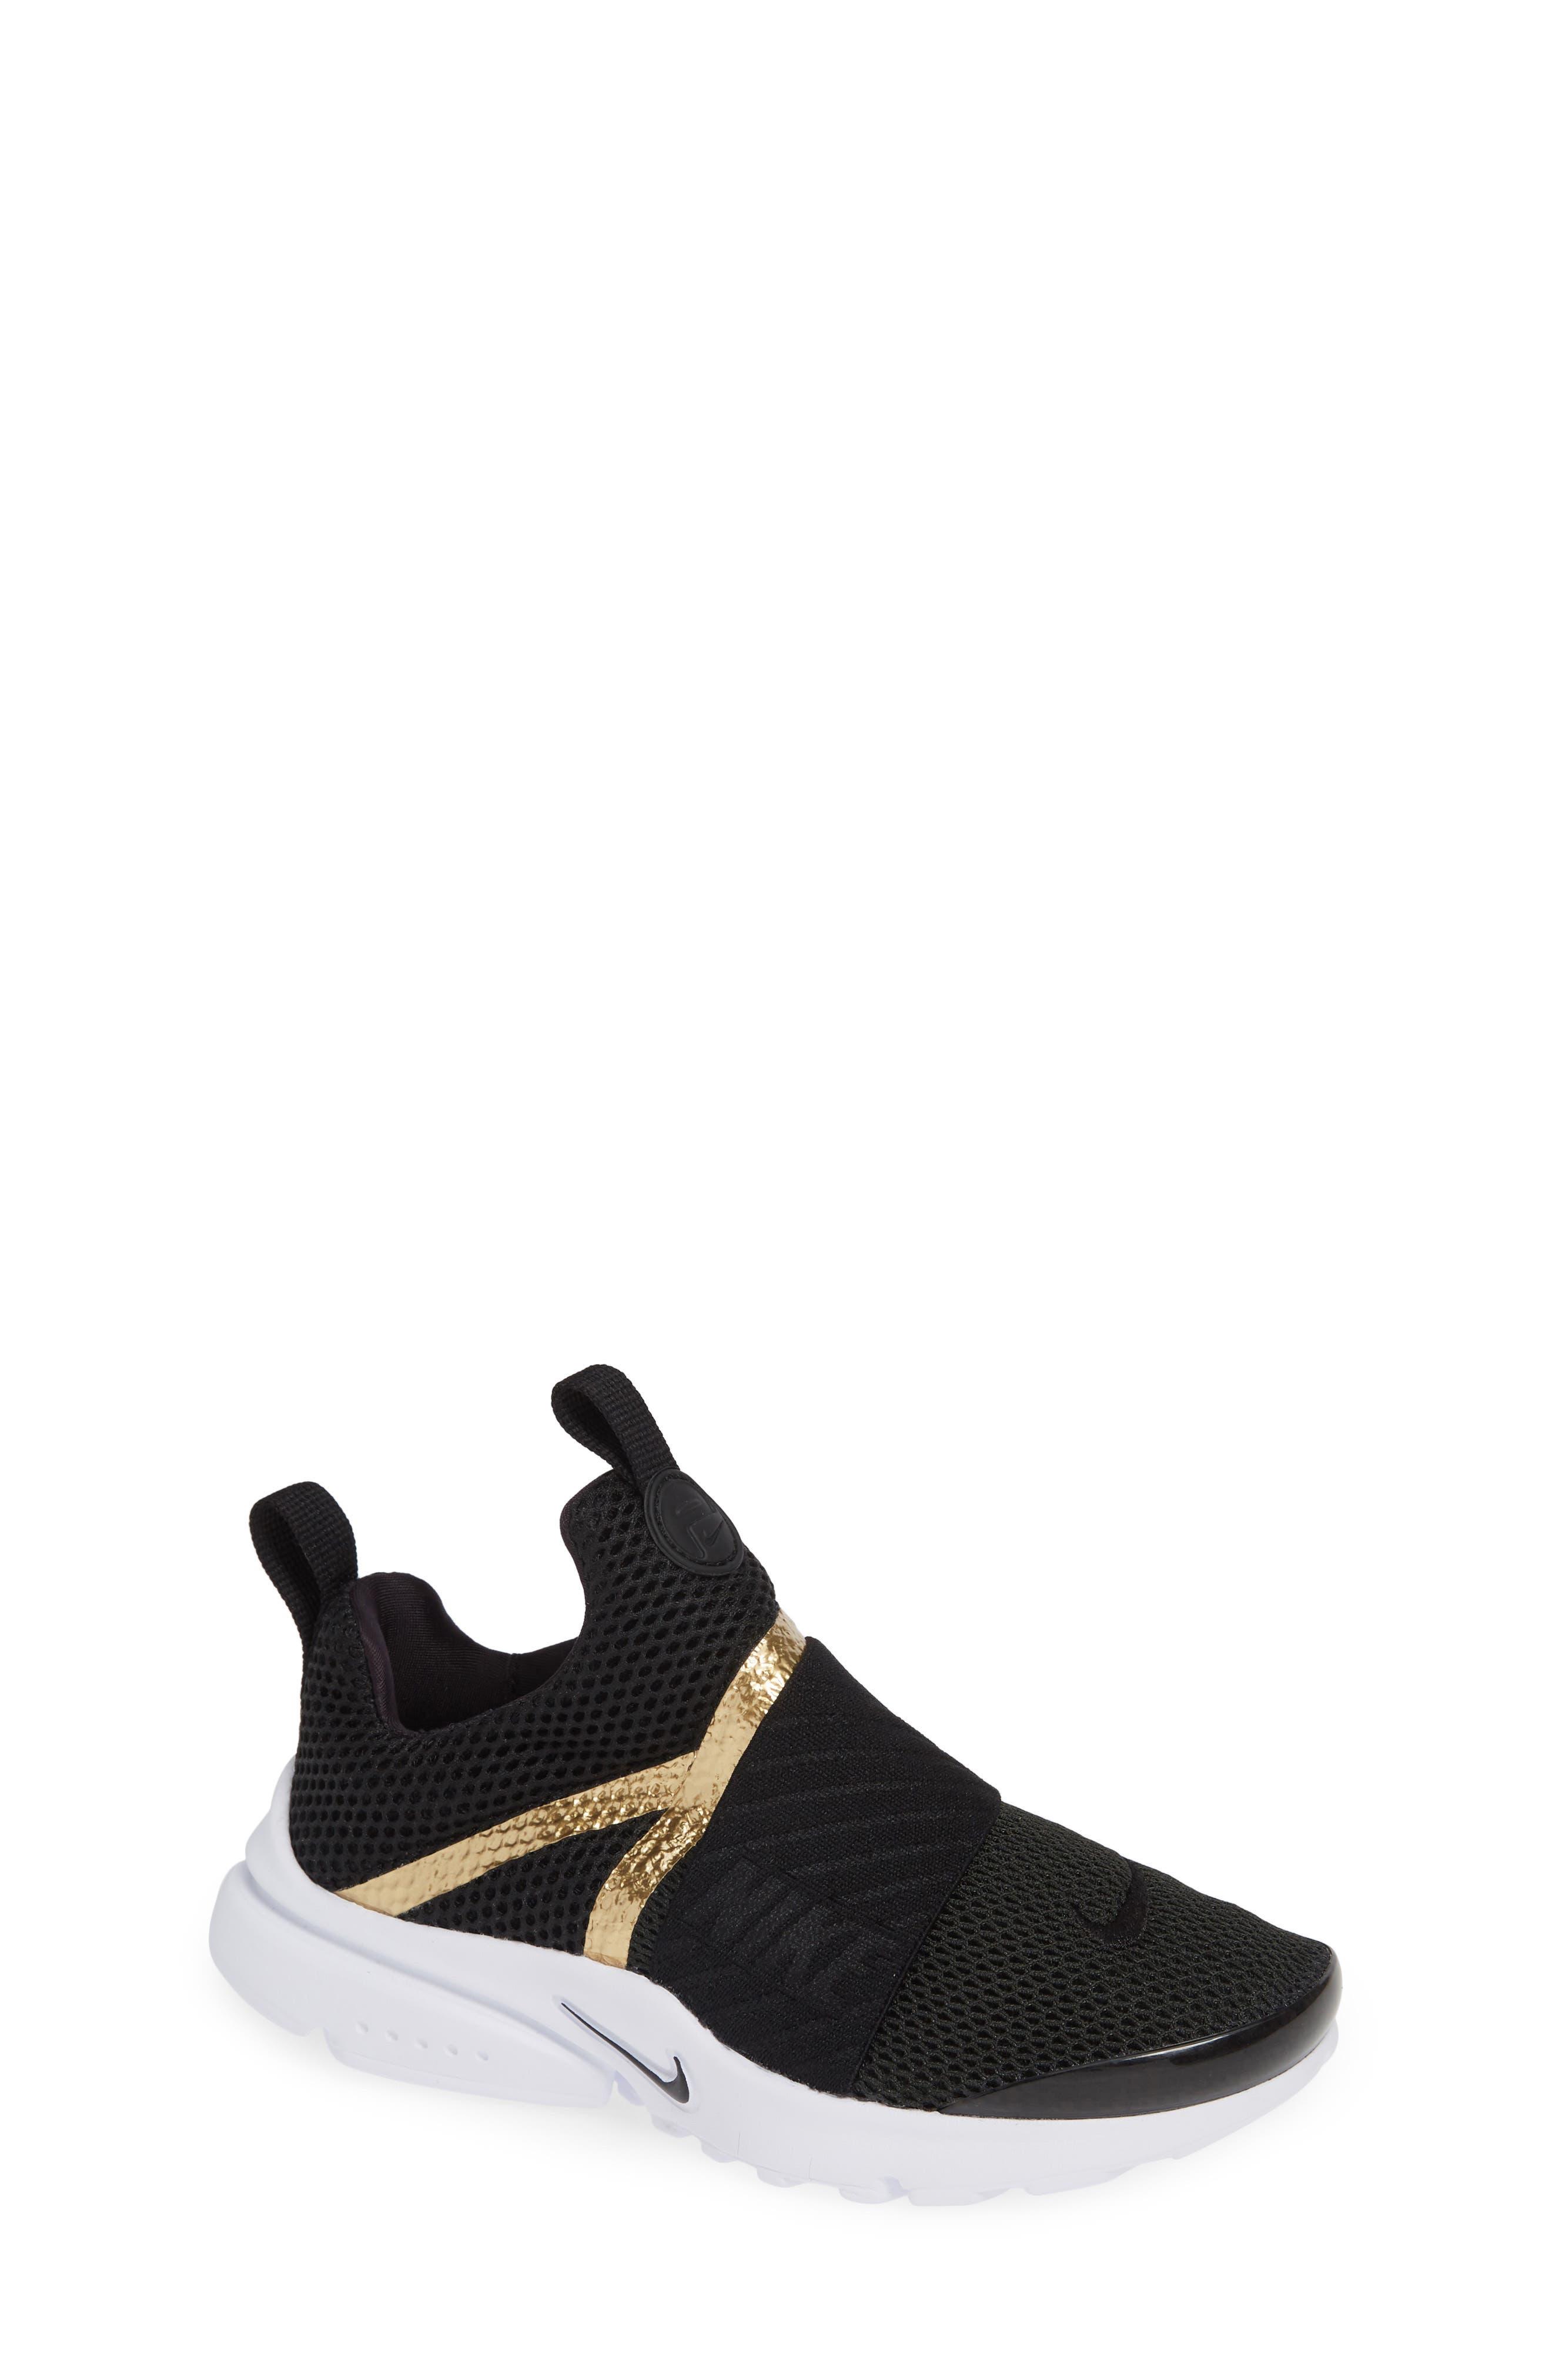 Presto Extreme Sneaker,                         Main,                         color, Black/ Metallic Gold/ White